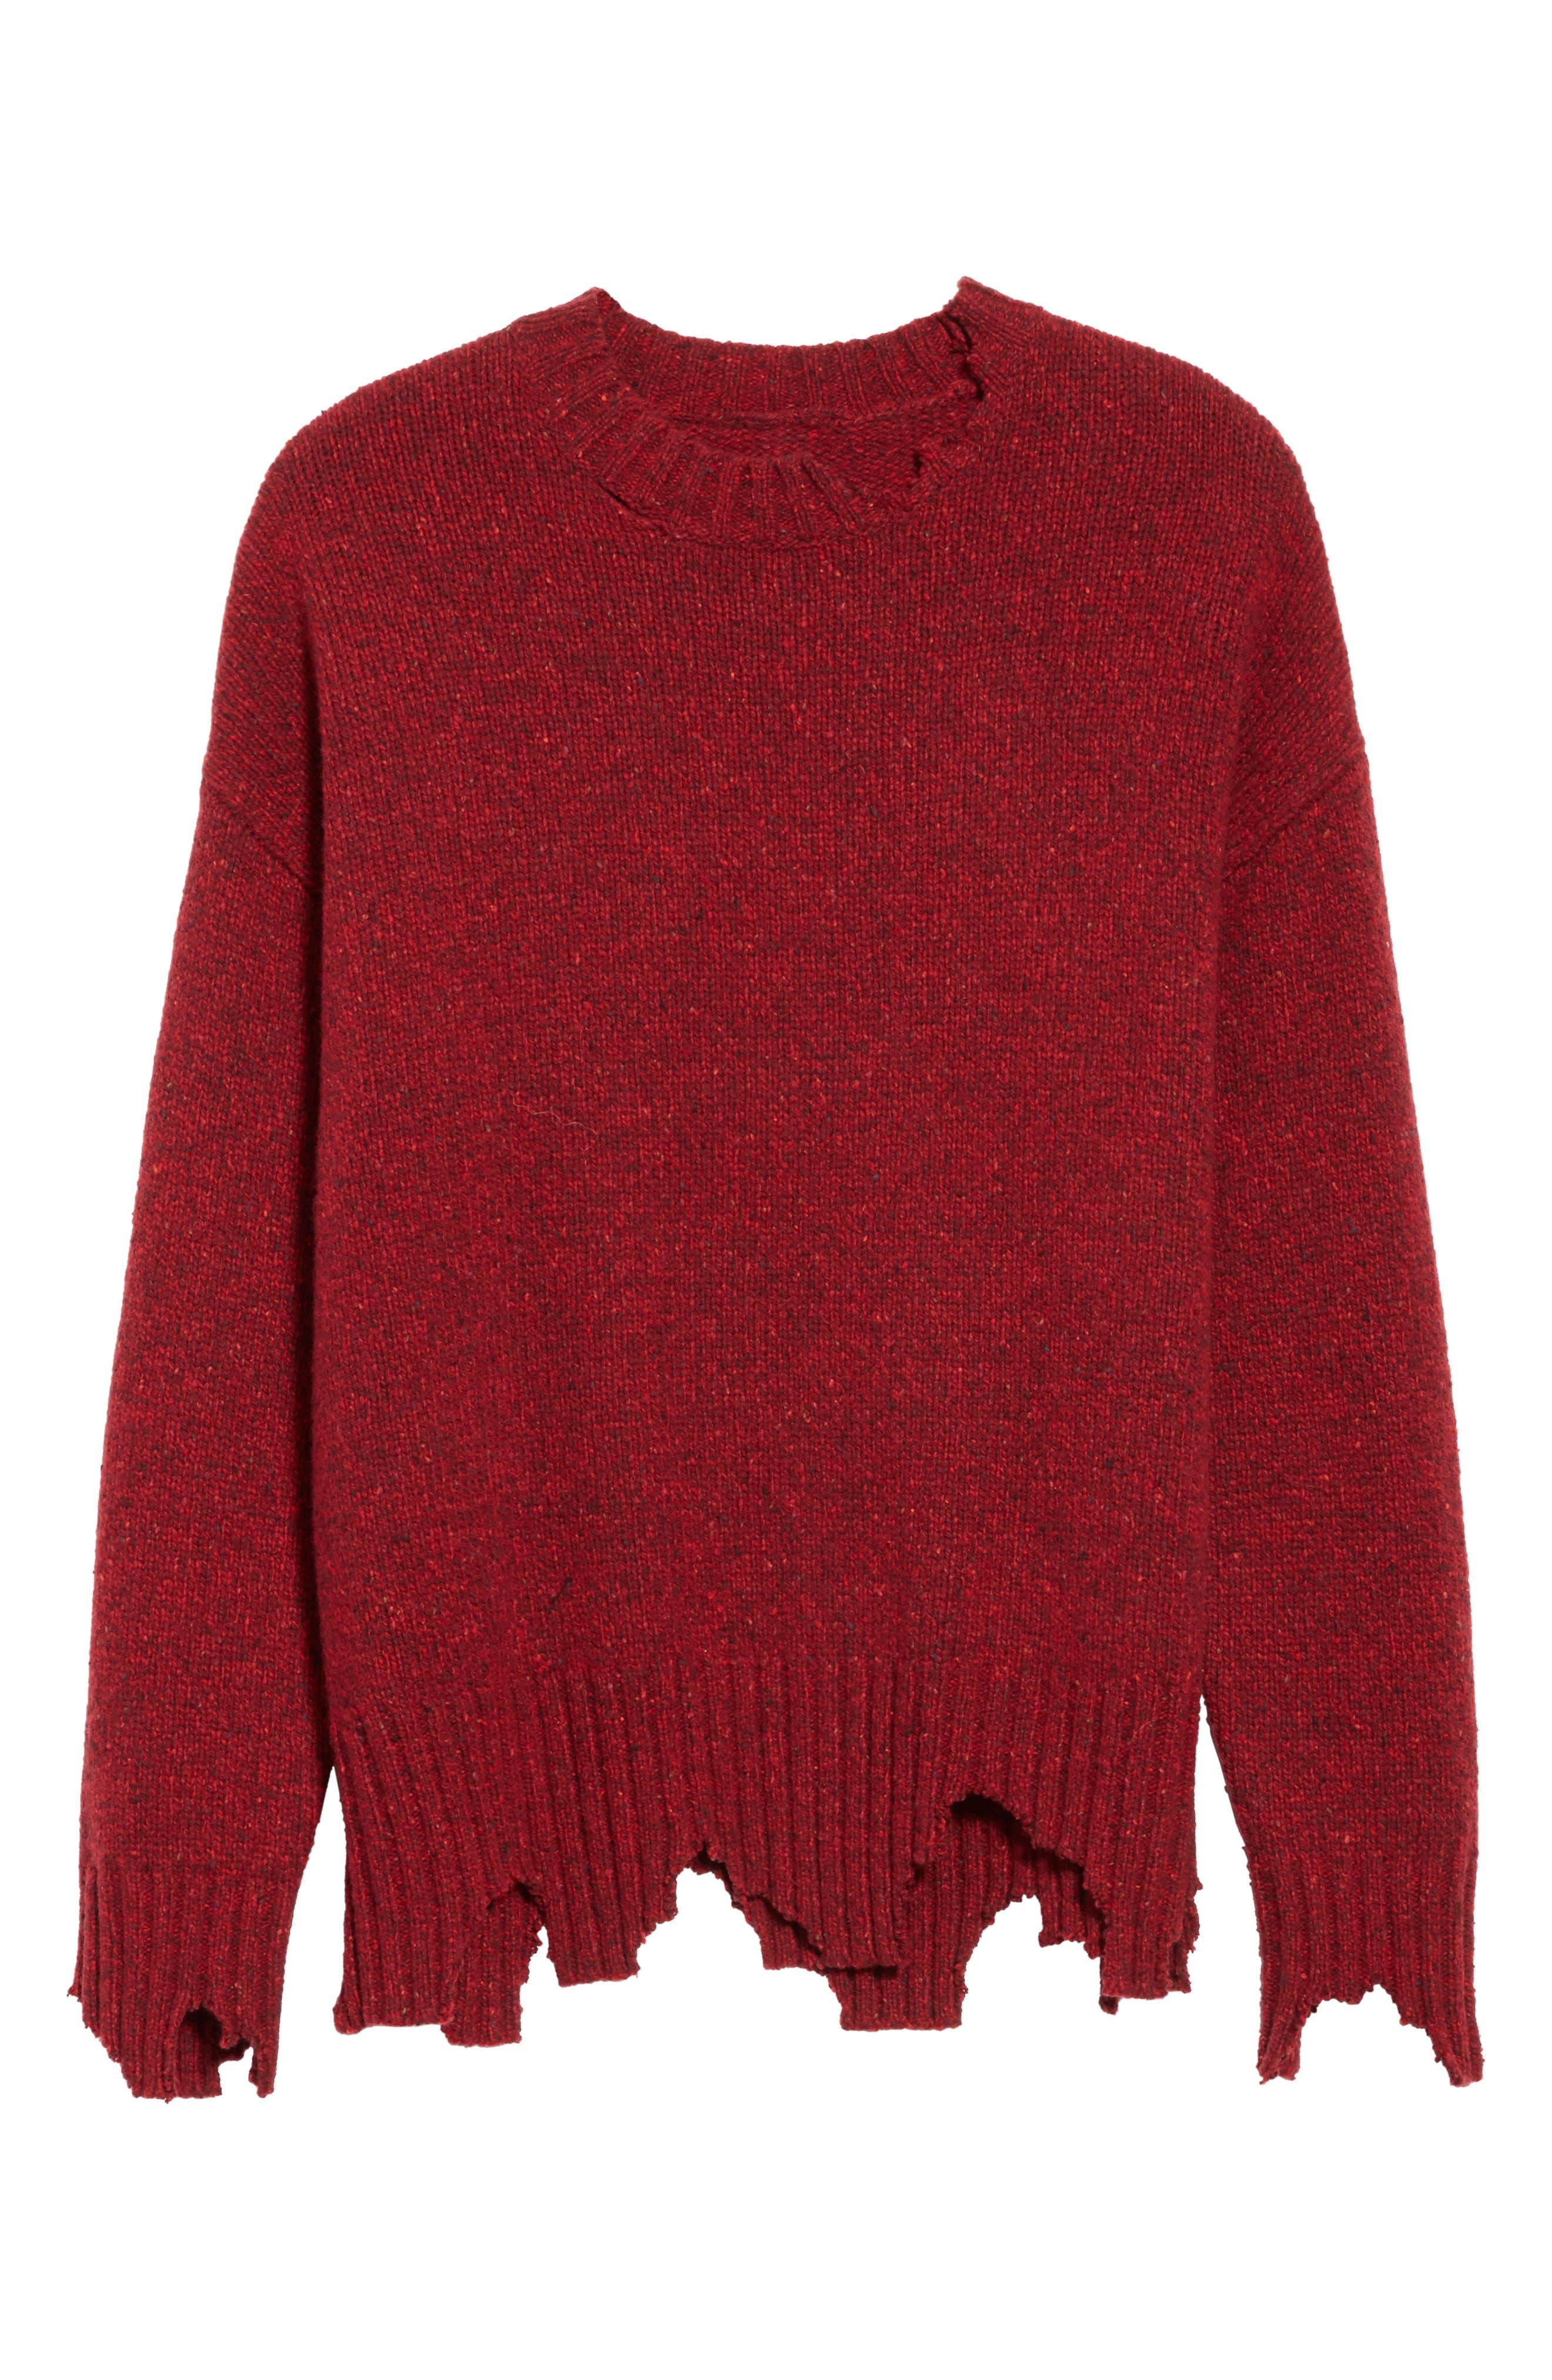 Destroyed Crewneck Sweater,                             Alternate thumbnail 6, color,                             600